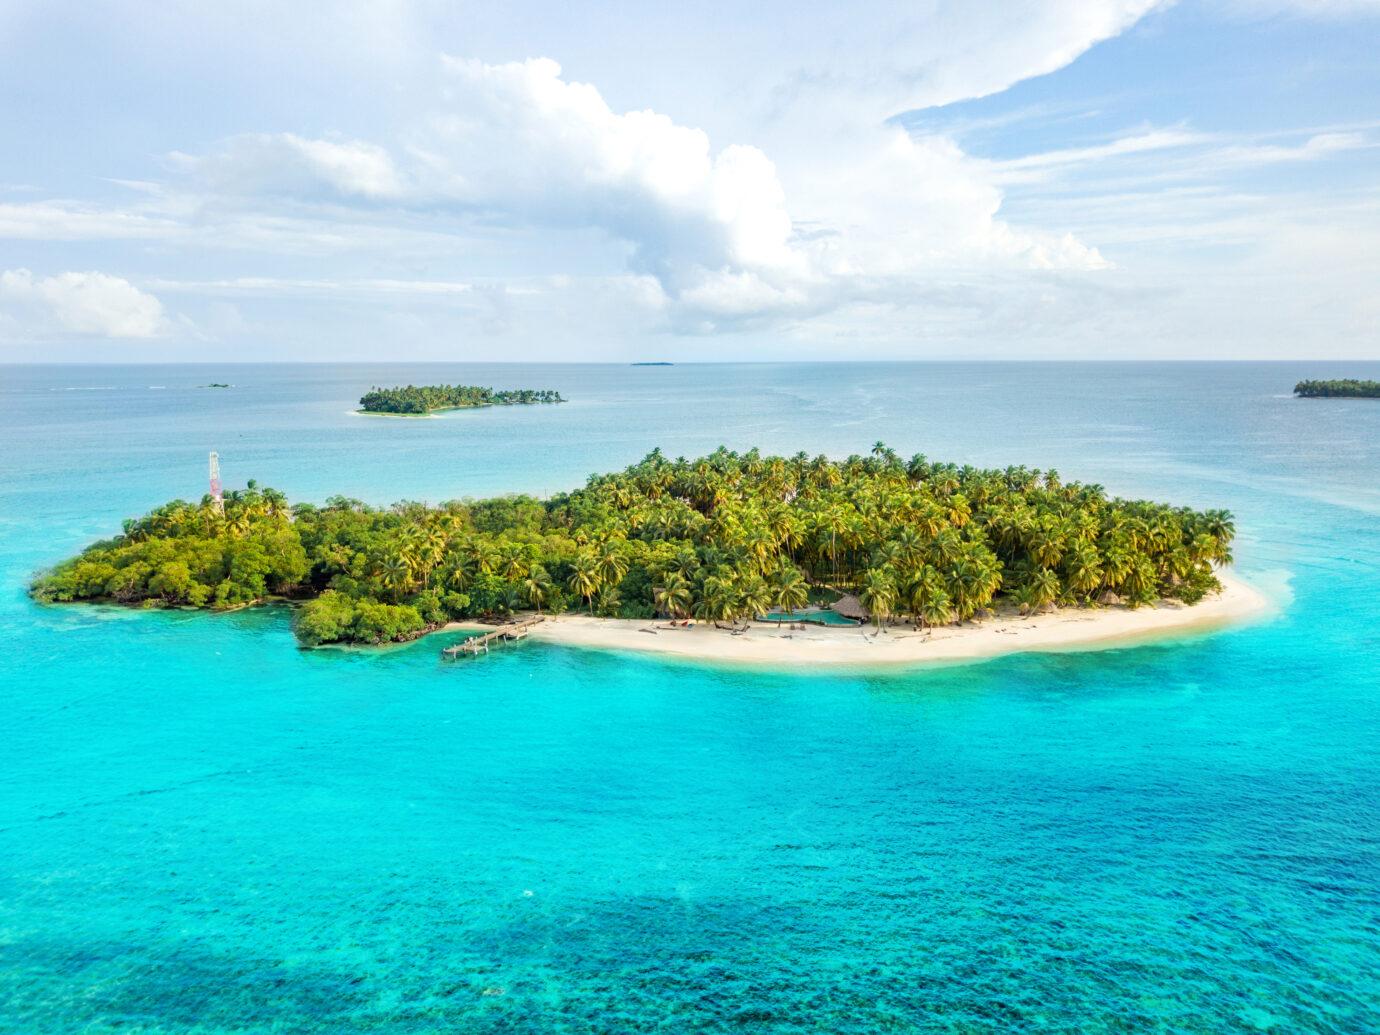 Aerial view of Calala Island, Nicaragua